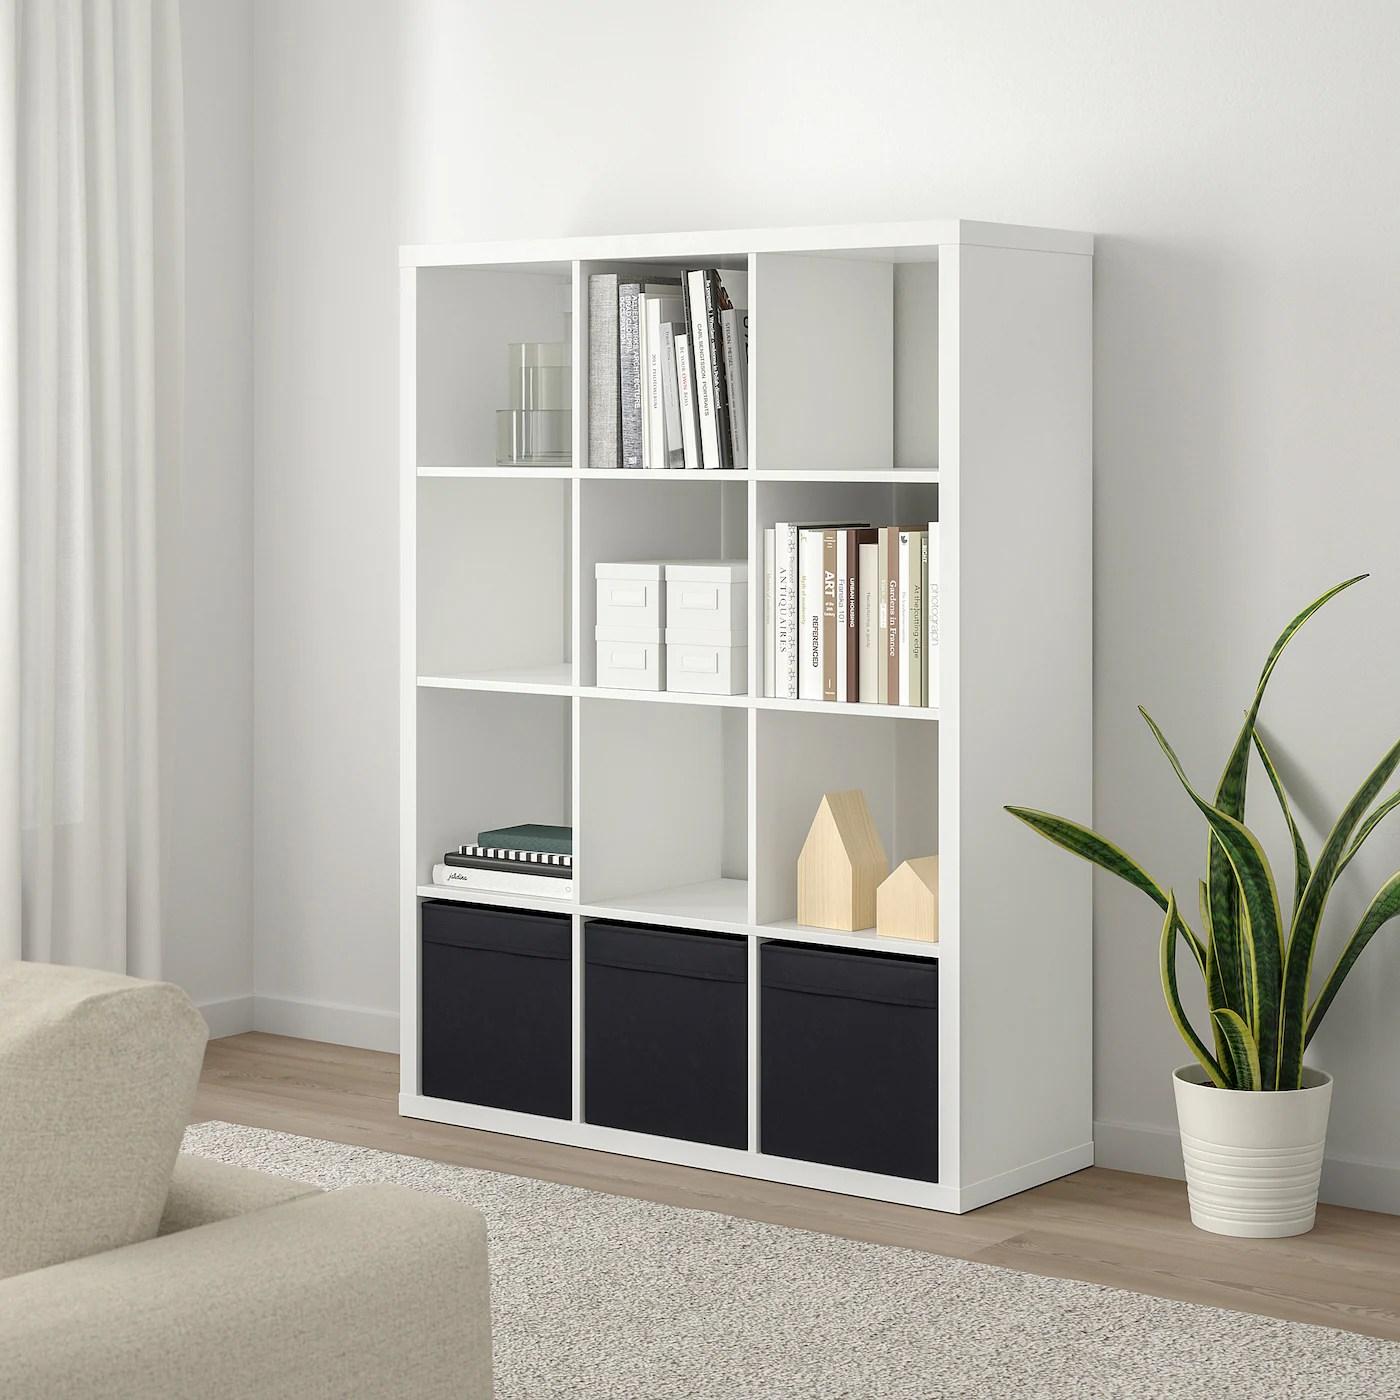 Kallax Shelving Unit White 112x147 Cm Ikea Switzerland